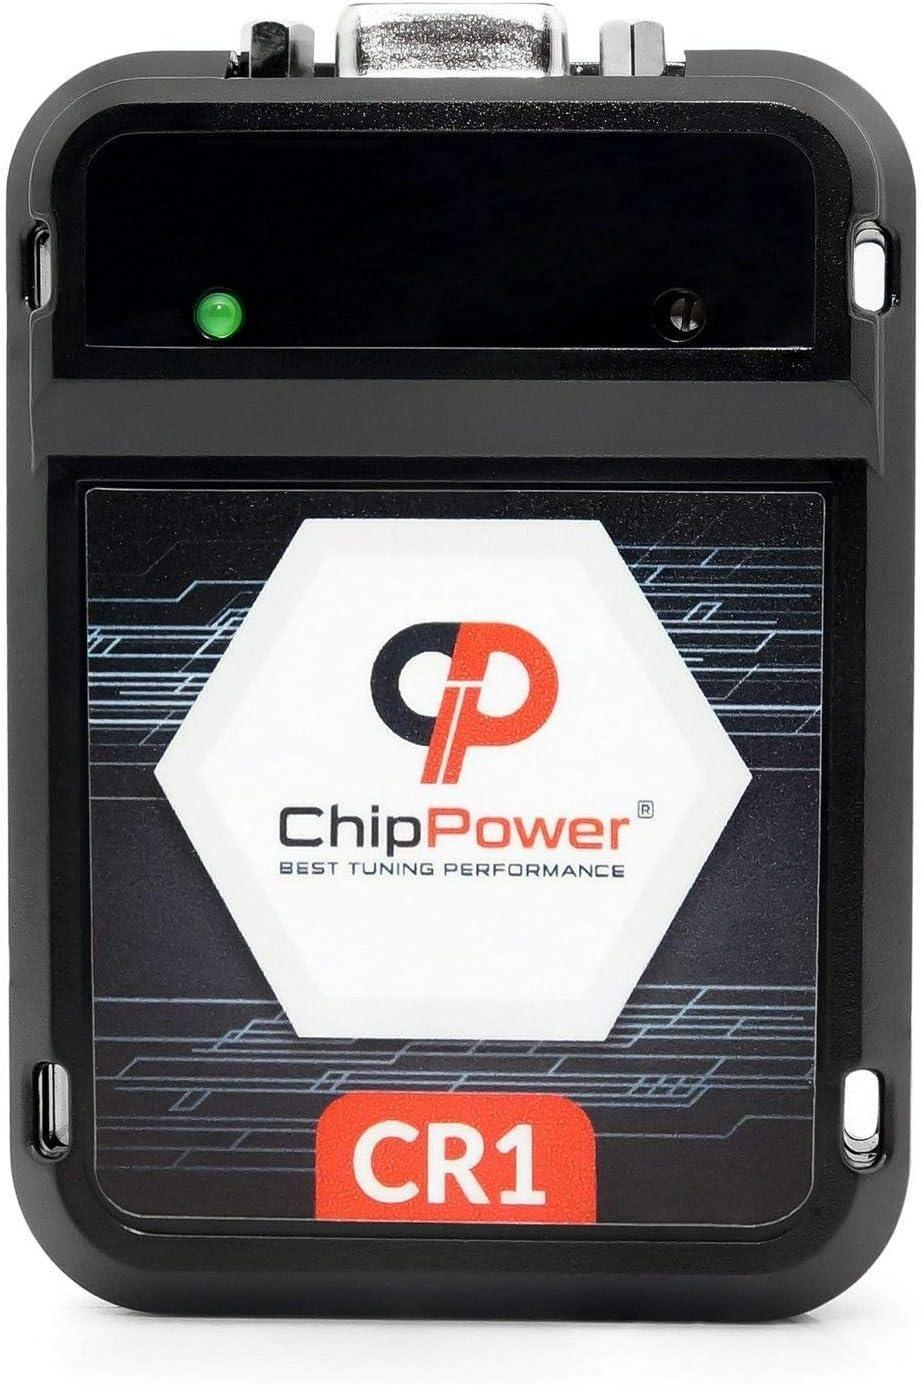 Chip de Potencia CR1 para ANTARA 2.2 CDTI 120 kW 163 CV Tuning Box Module Diesel